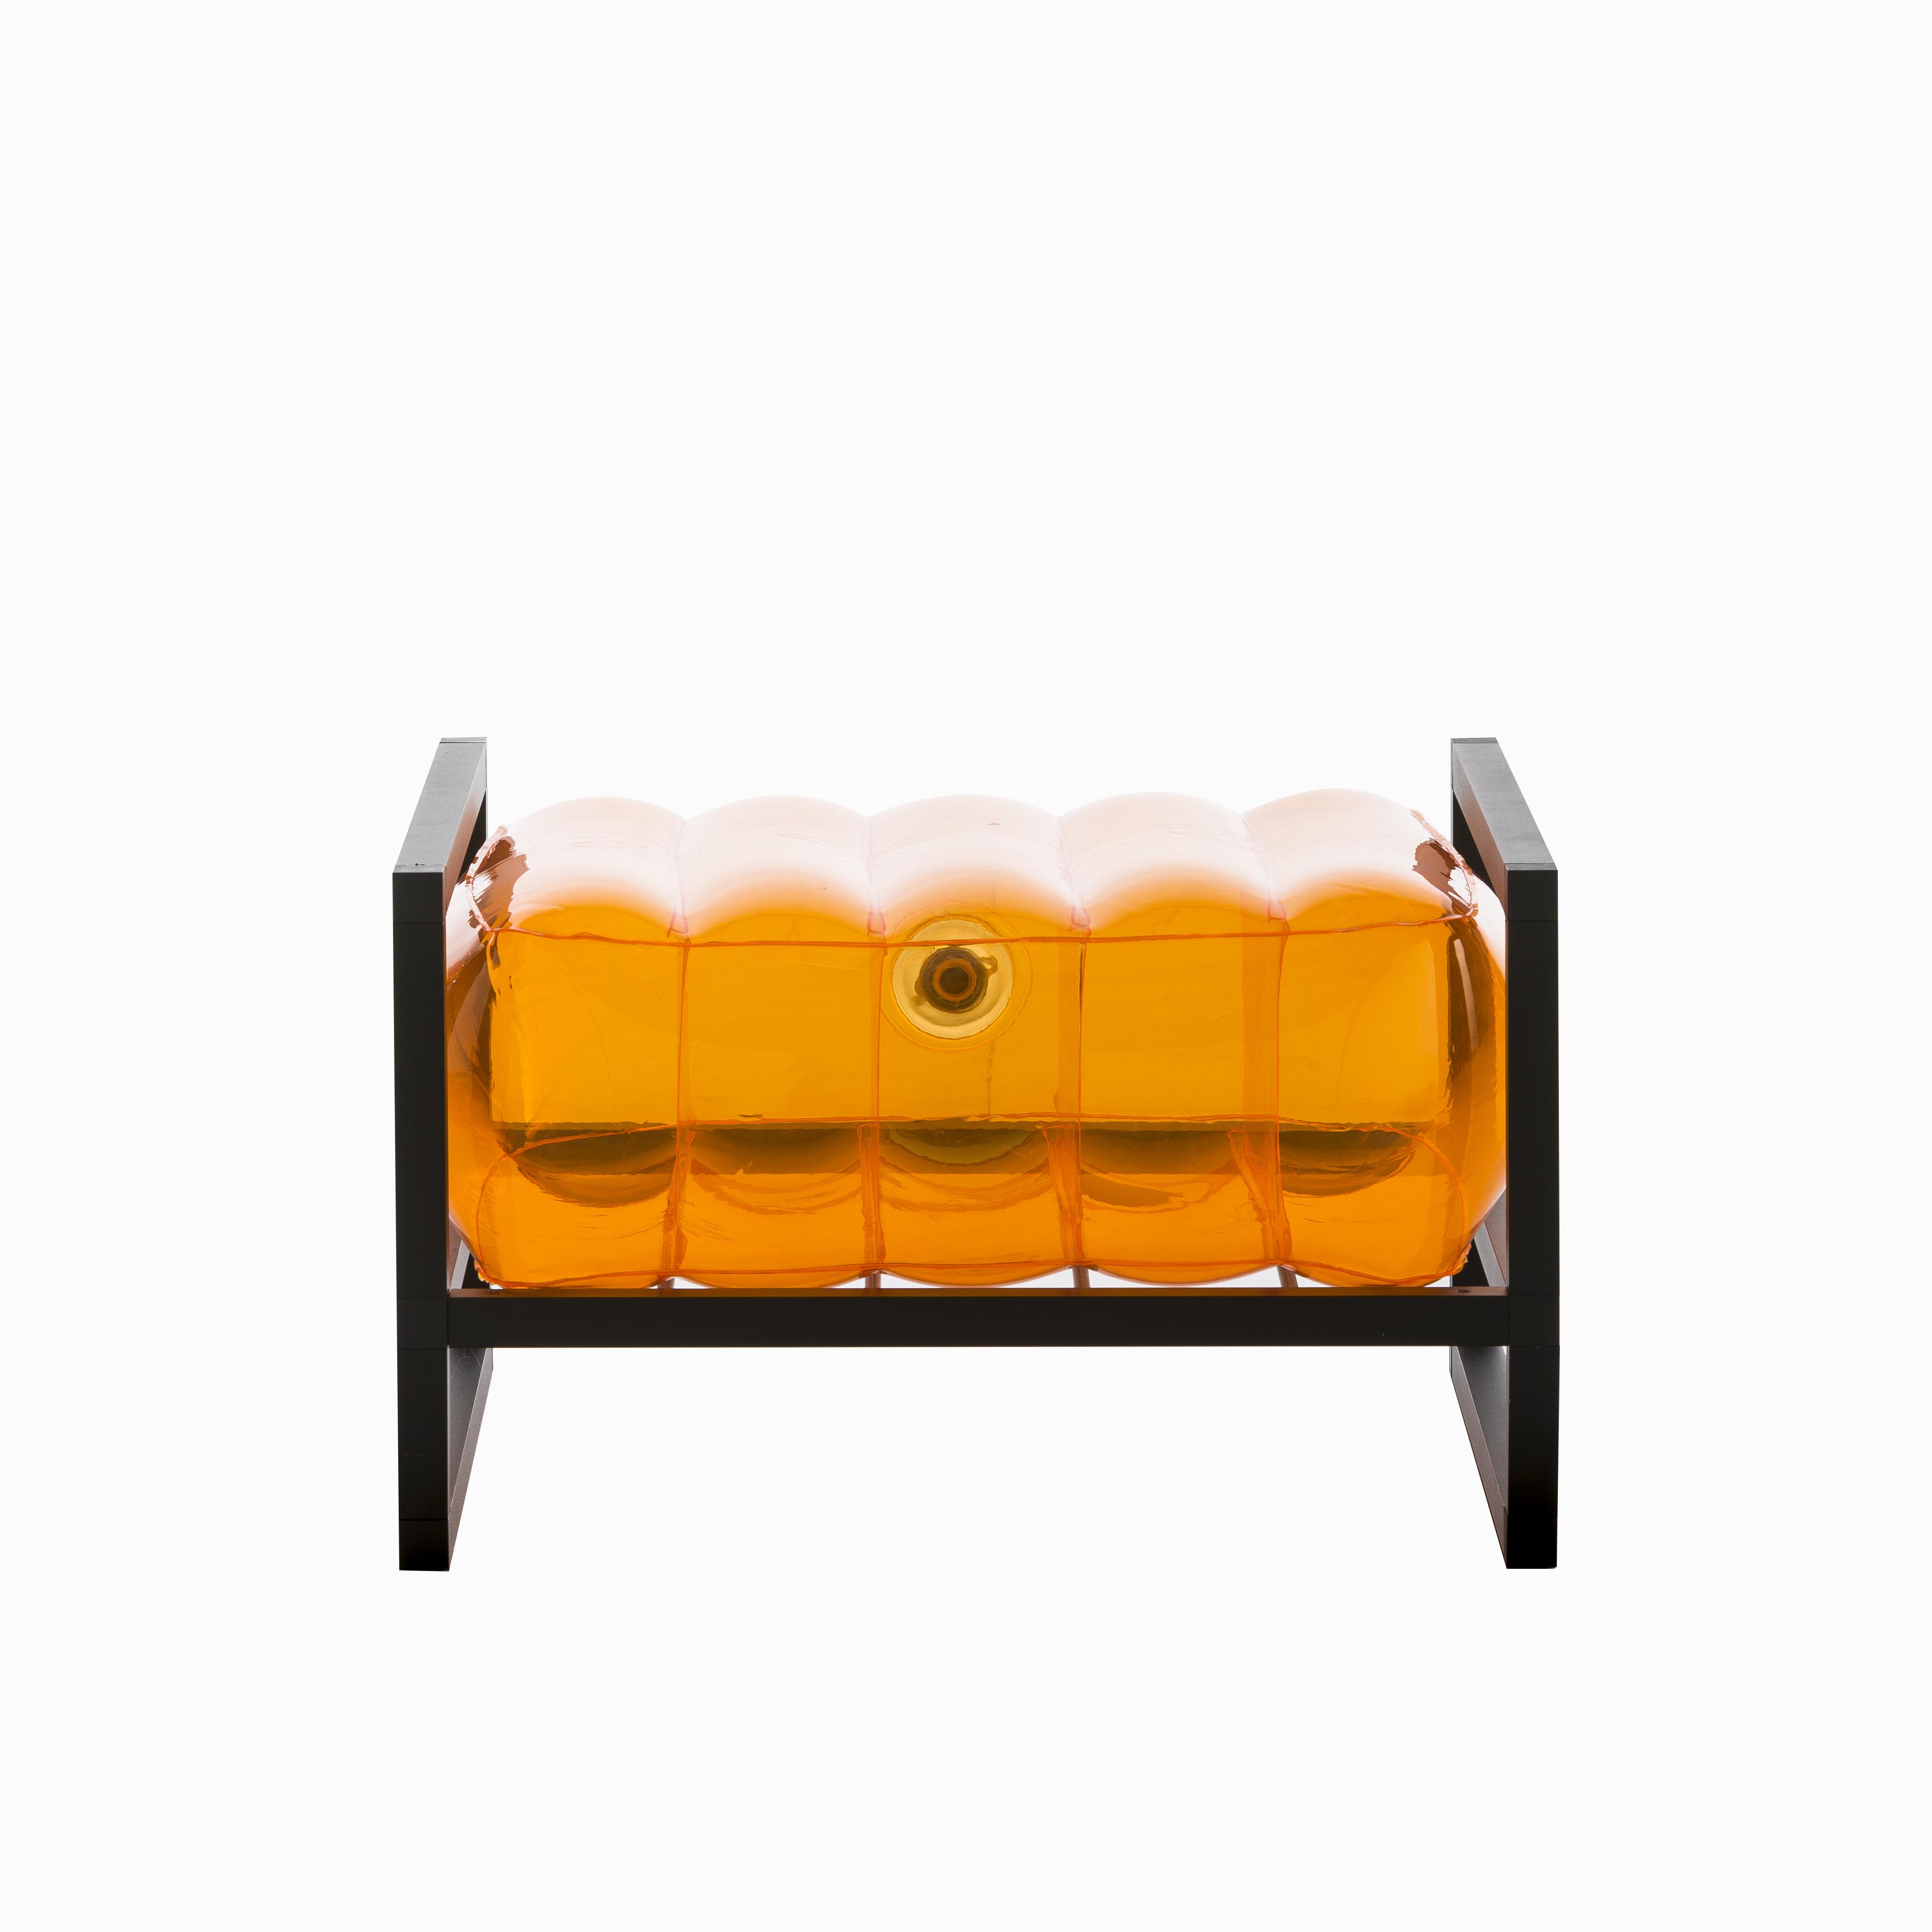 Pouf pvc orange cadre en aluminium